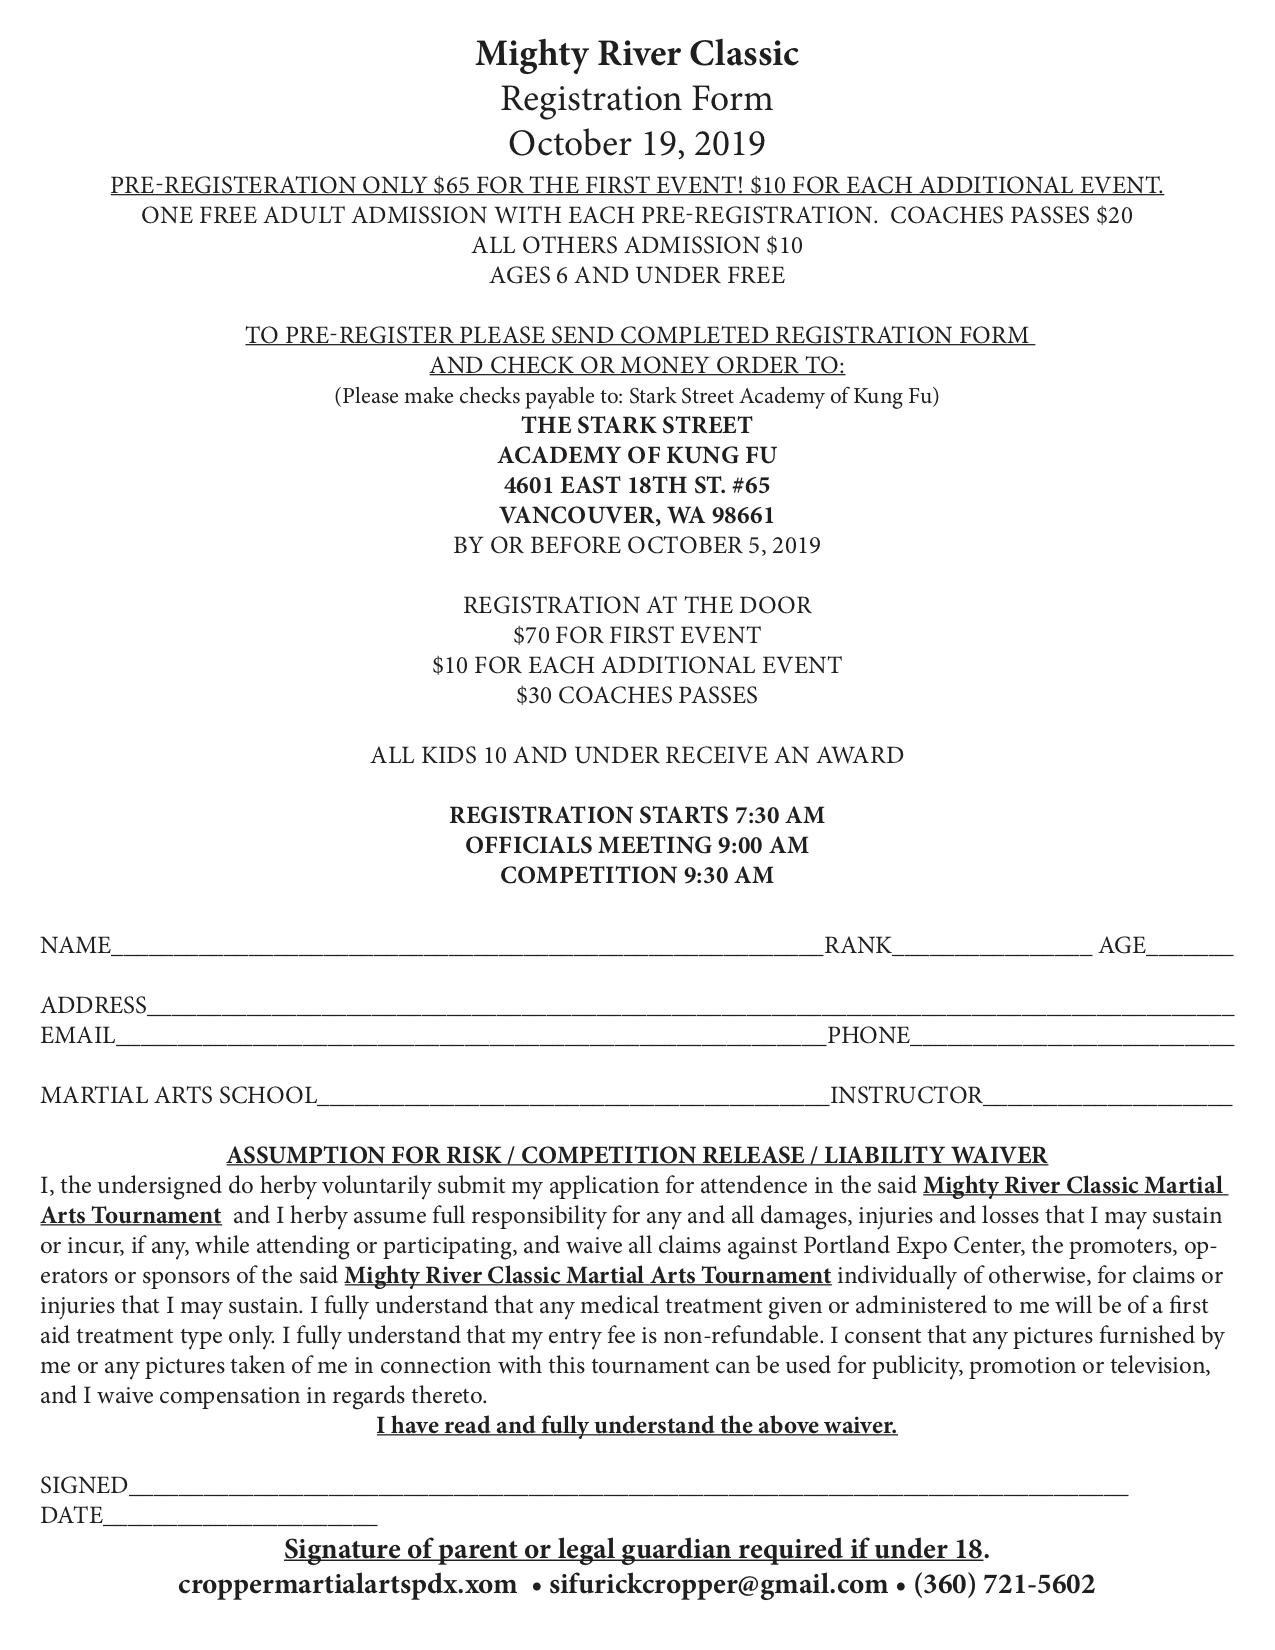 Registraition form.jpg